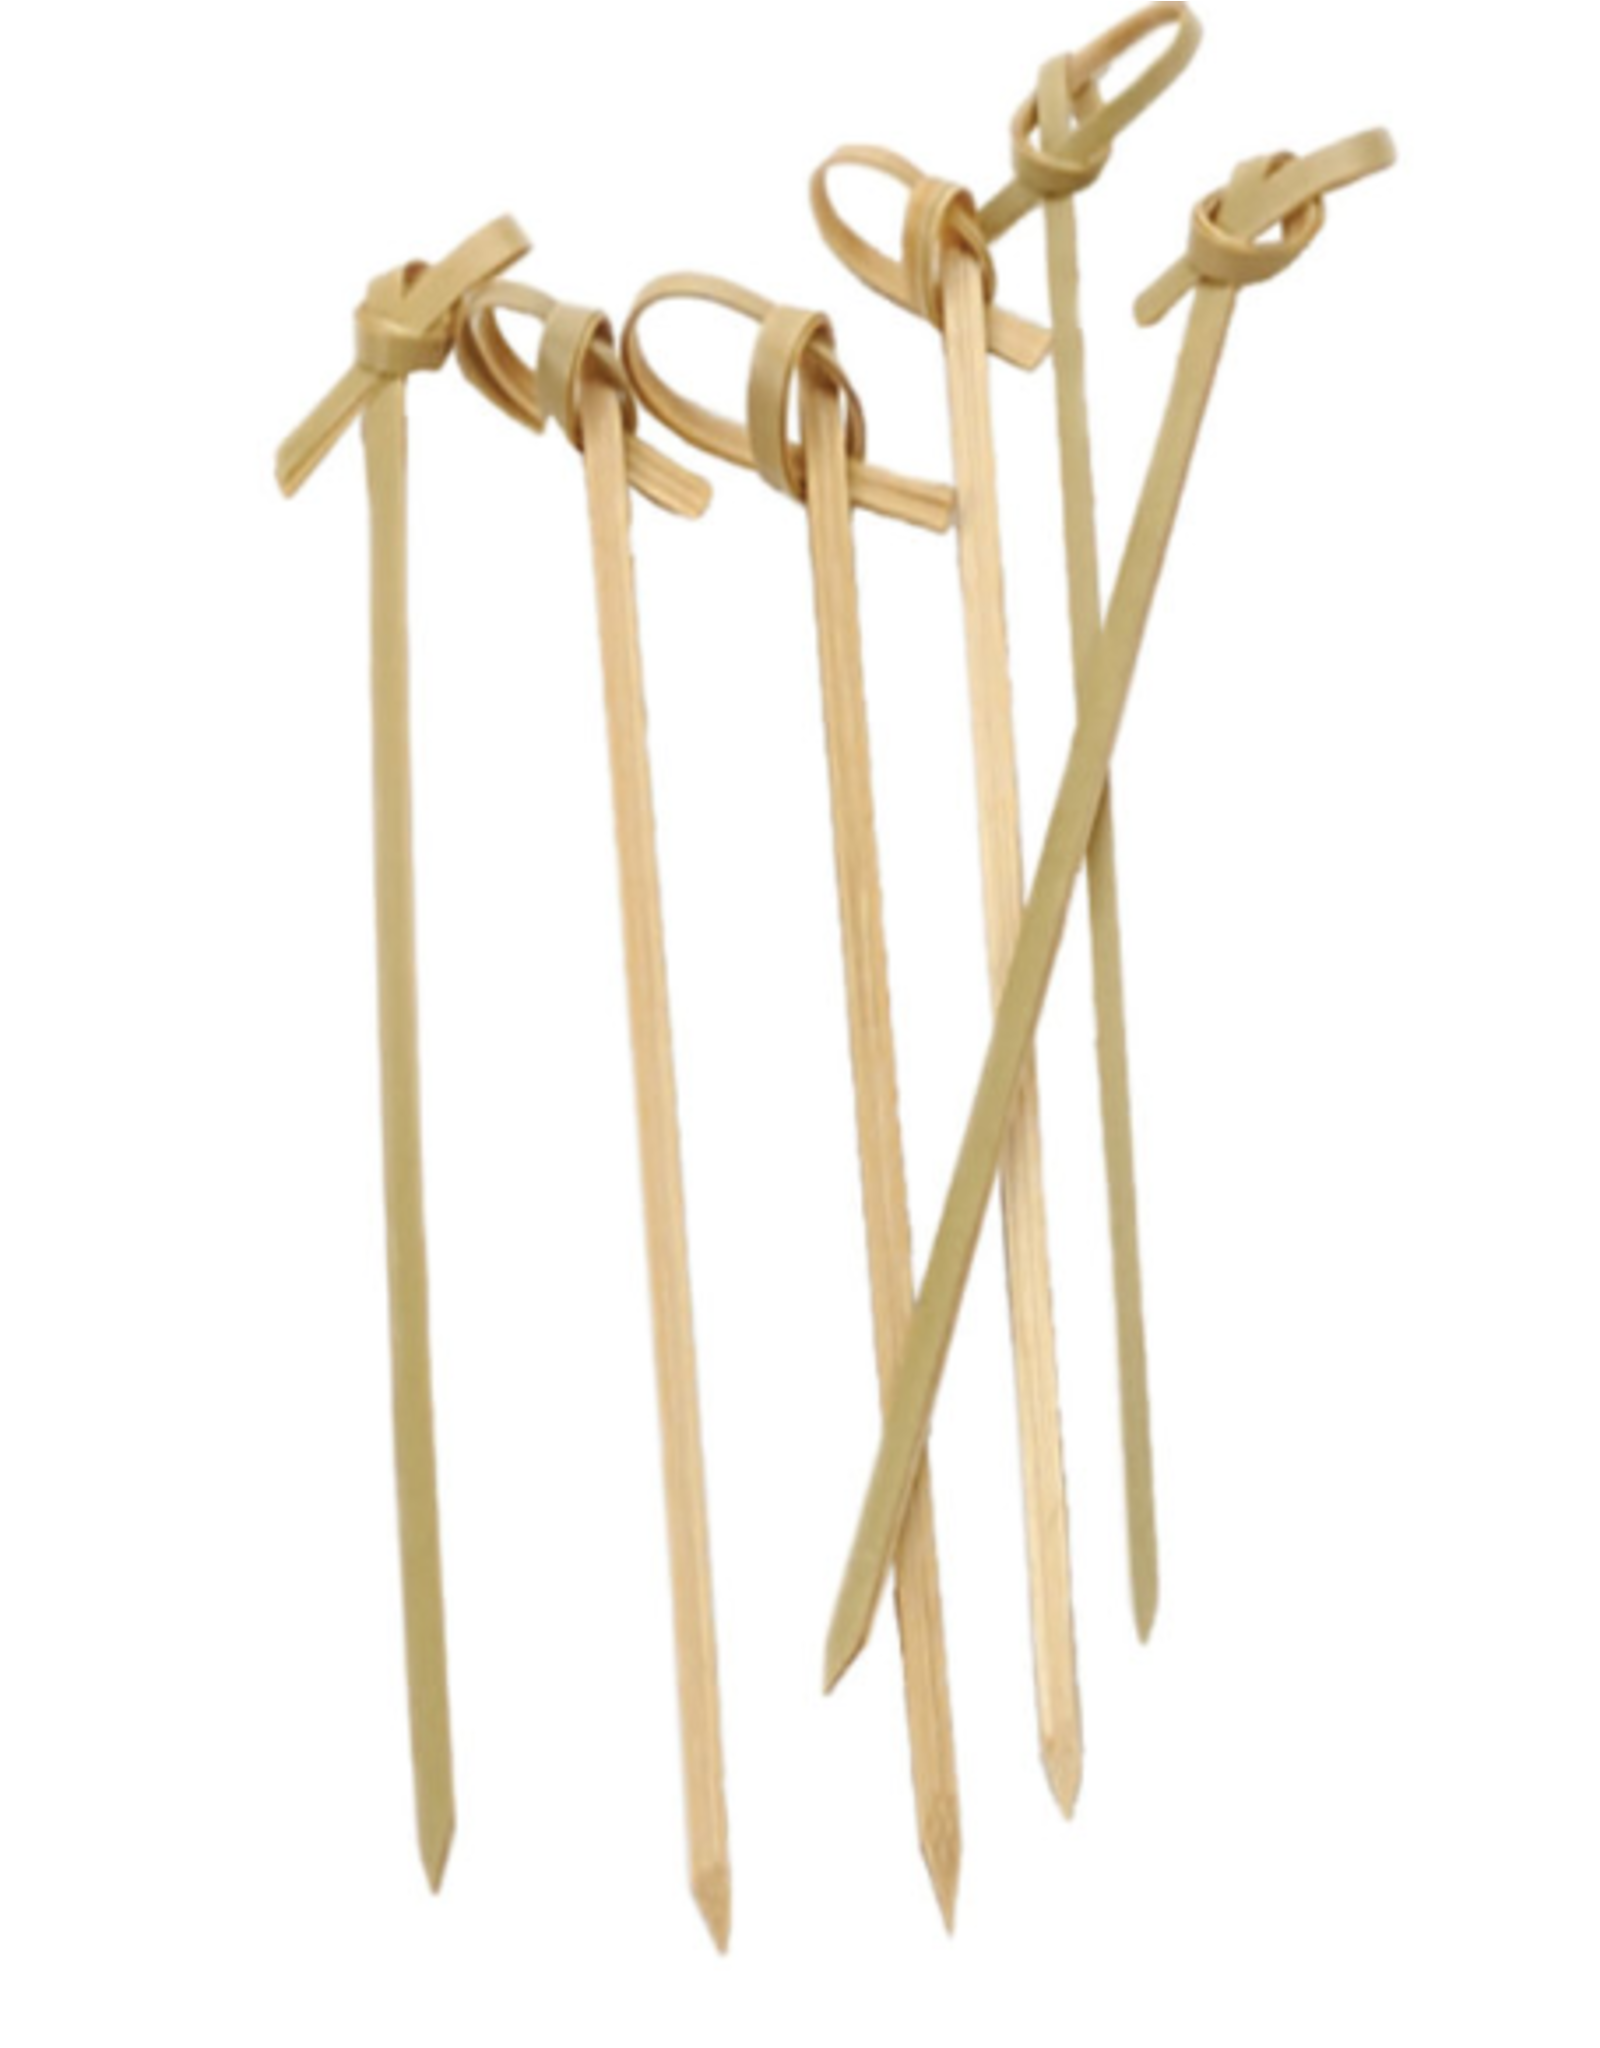 RSVP Bamboo Knot Picks 50pcs